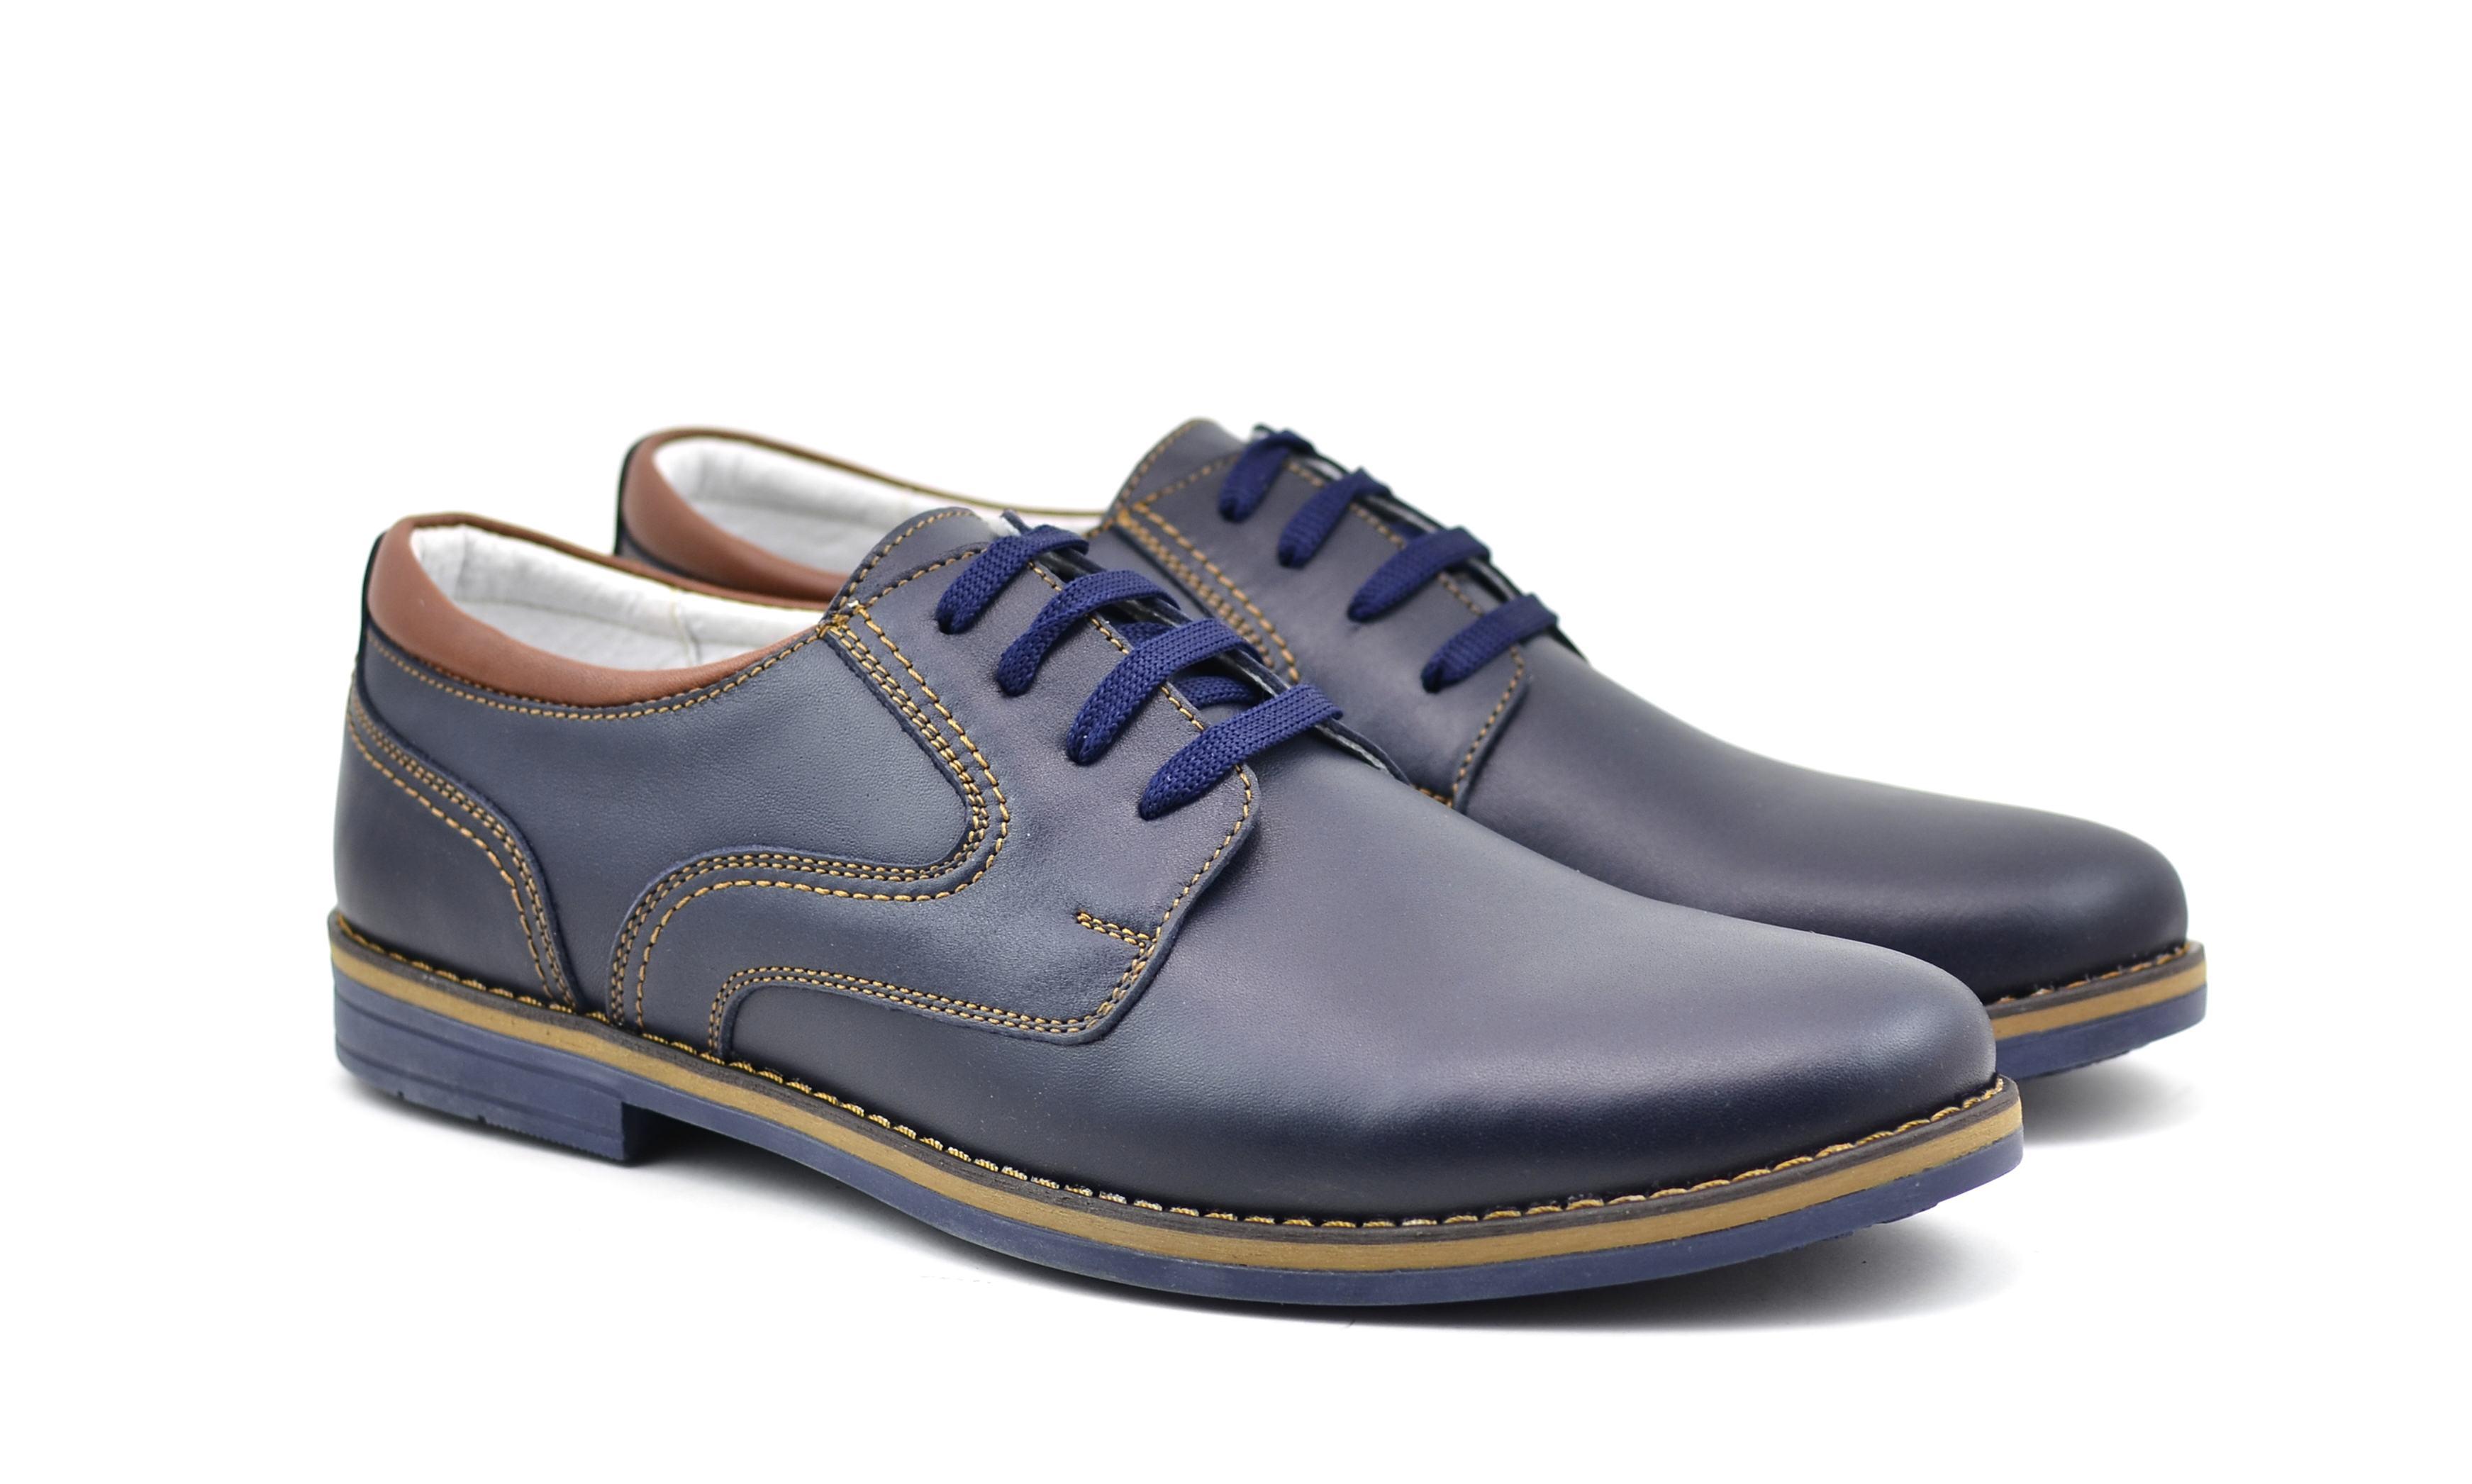 Pantofi barbati casual din piele naturala - DANY ALBASTRU